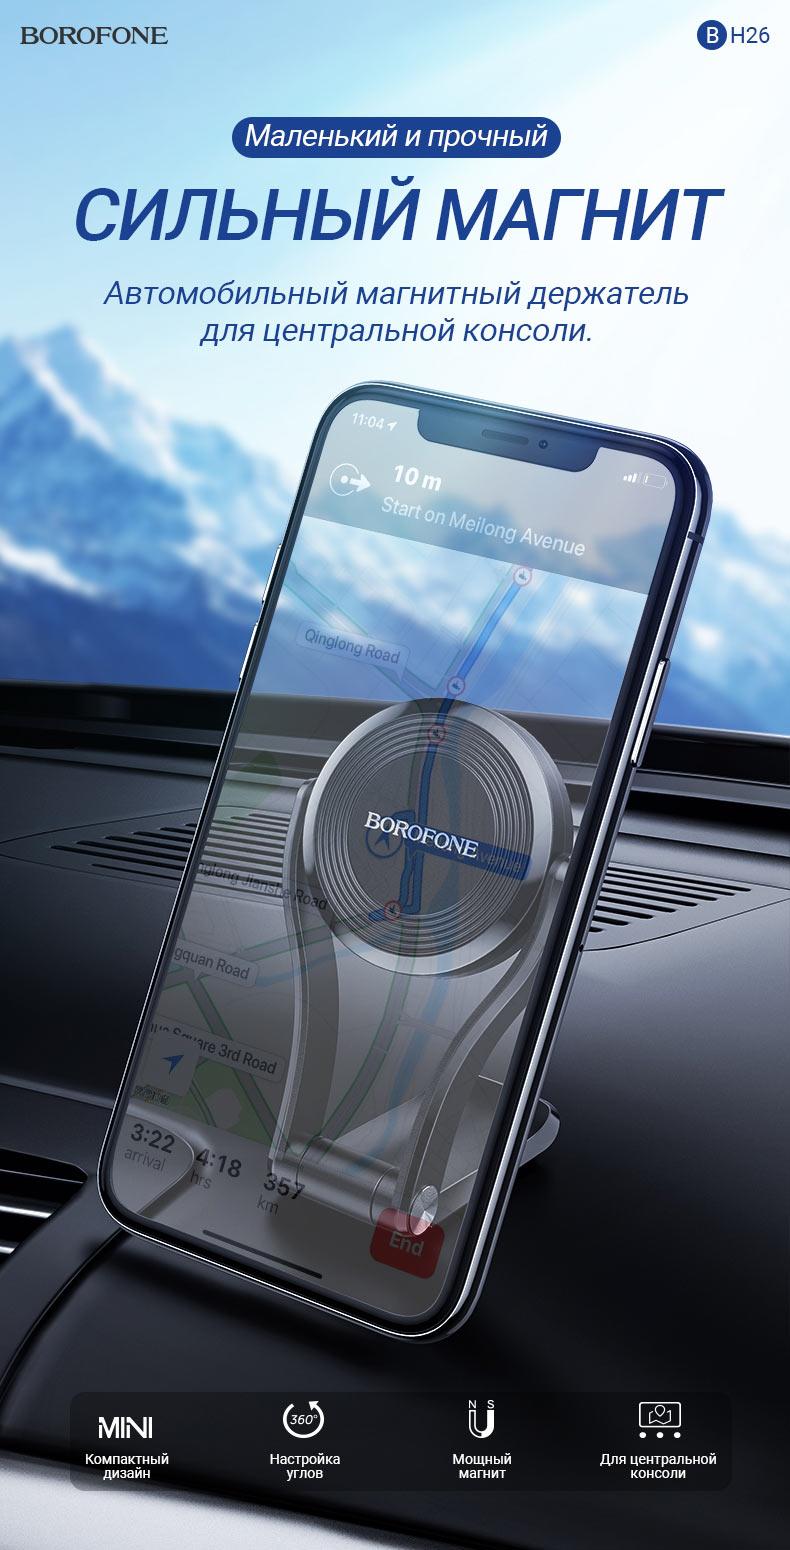 borofone news bh26 keeper center console magnetic car holder ru